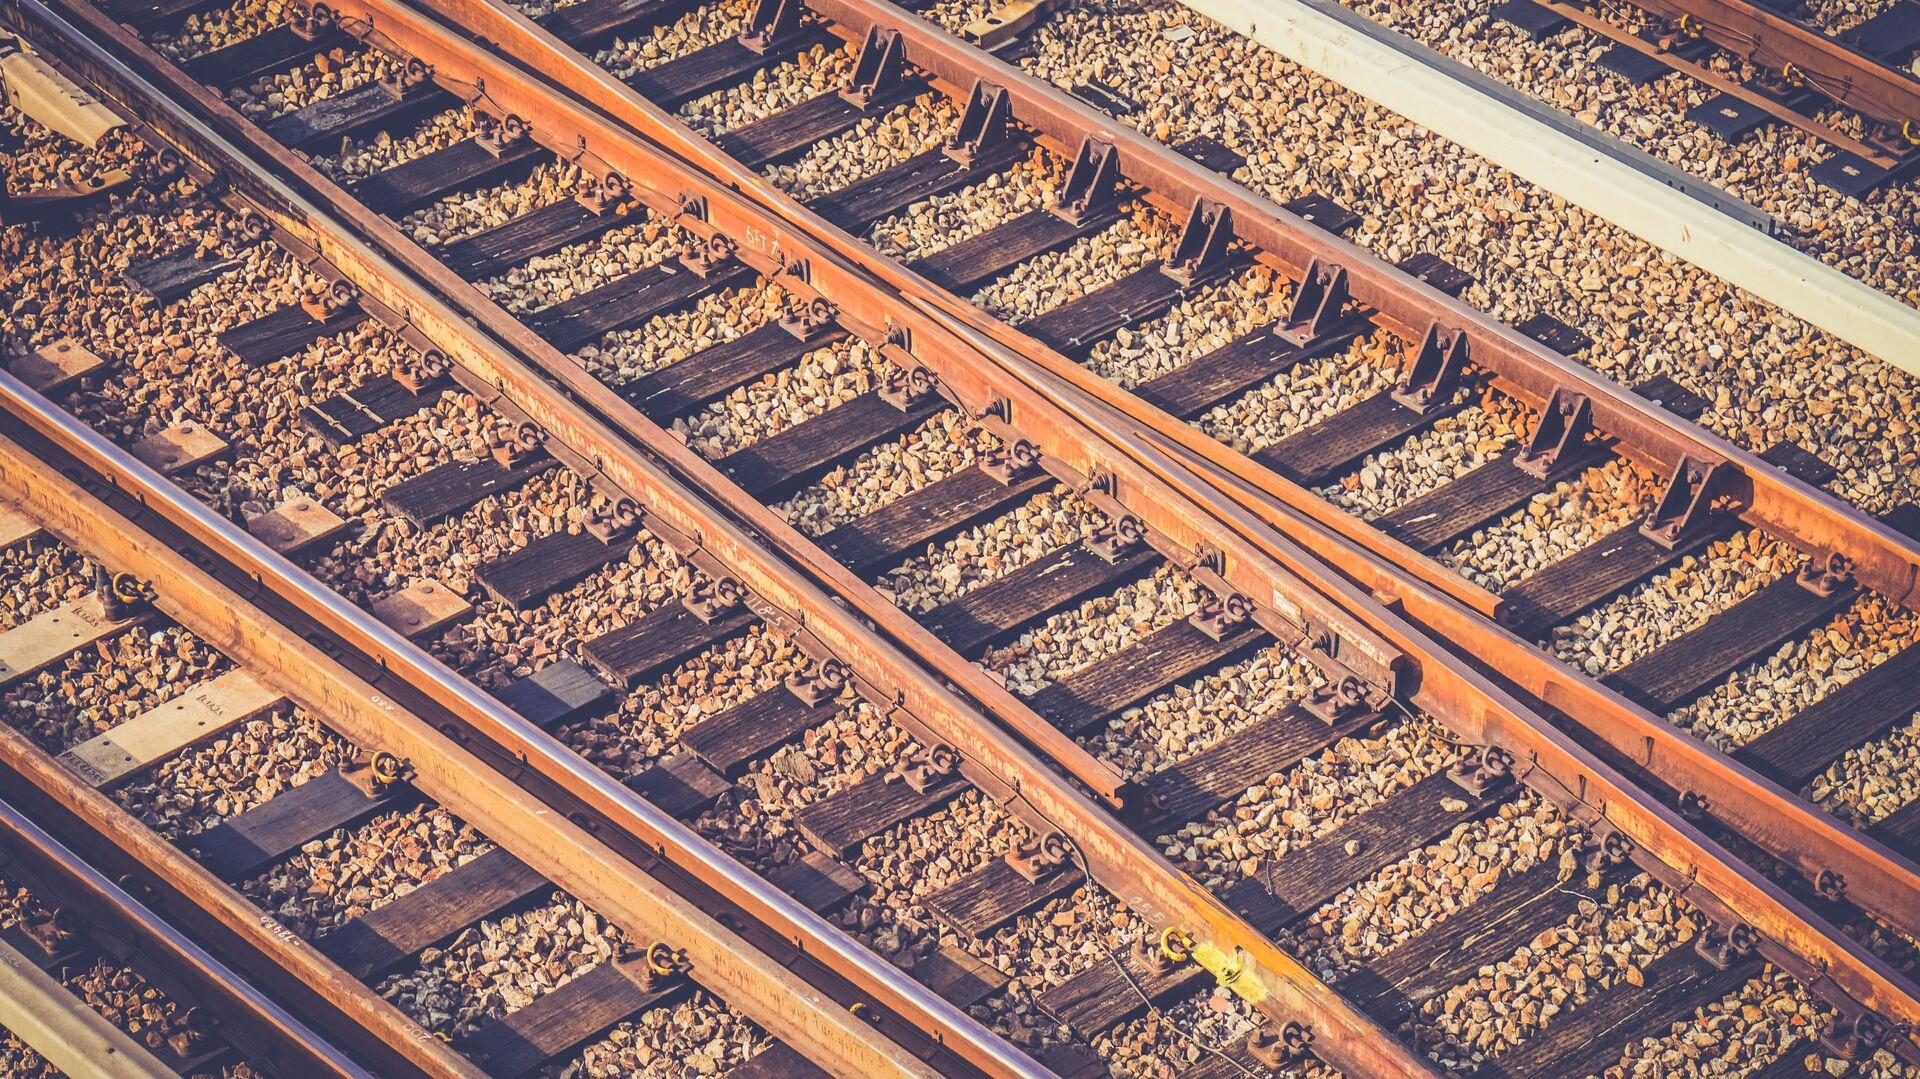 Ferrocarril (imagen referencial) - Sputnik Mundo, 1920, 24.08.2021